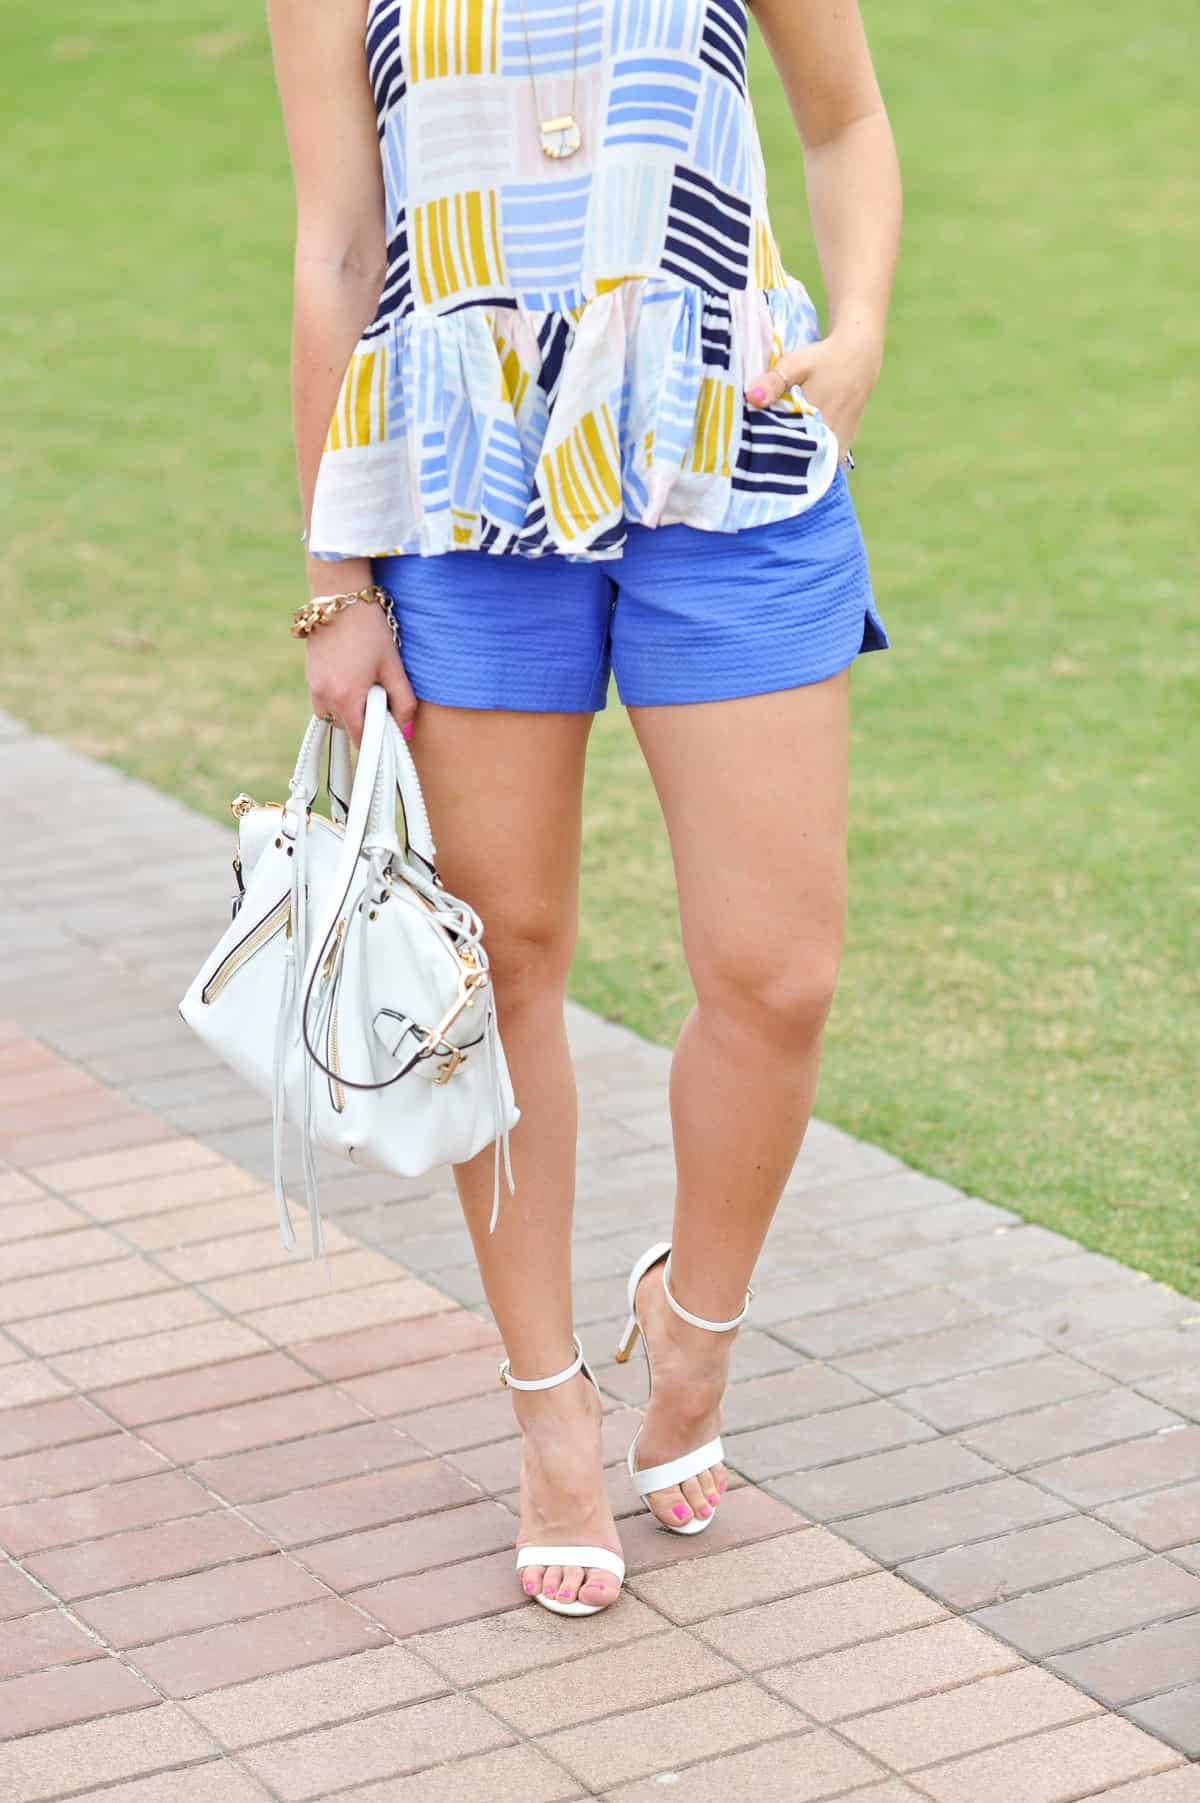 Old Navy printed peplum tank - summer outfit ideas - My Style Vita - @mystylevita - 16